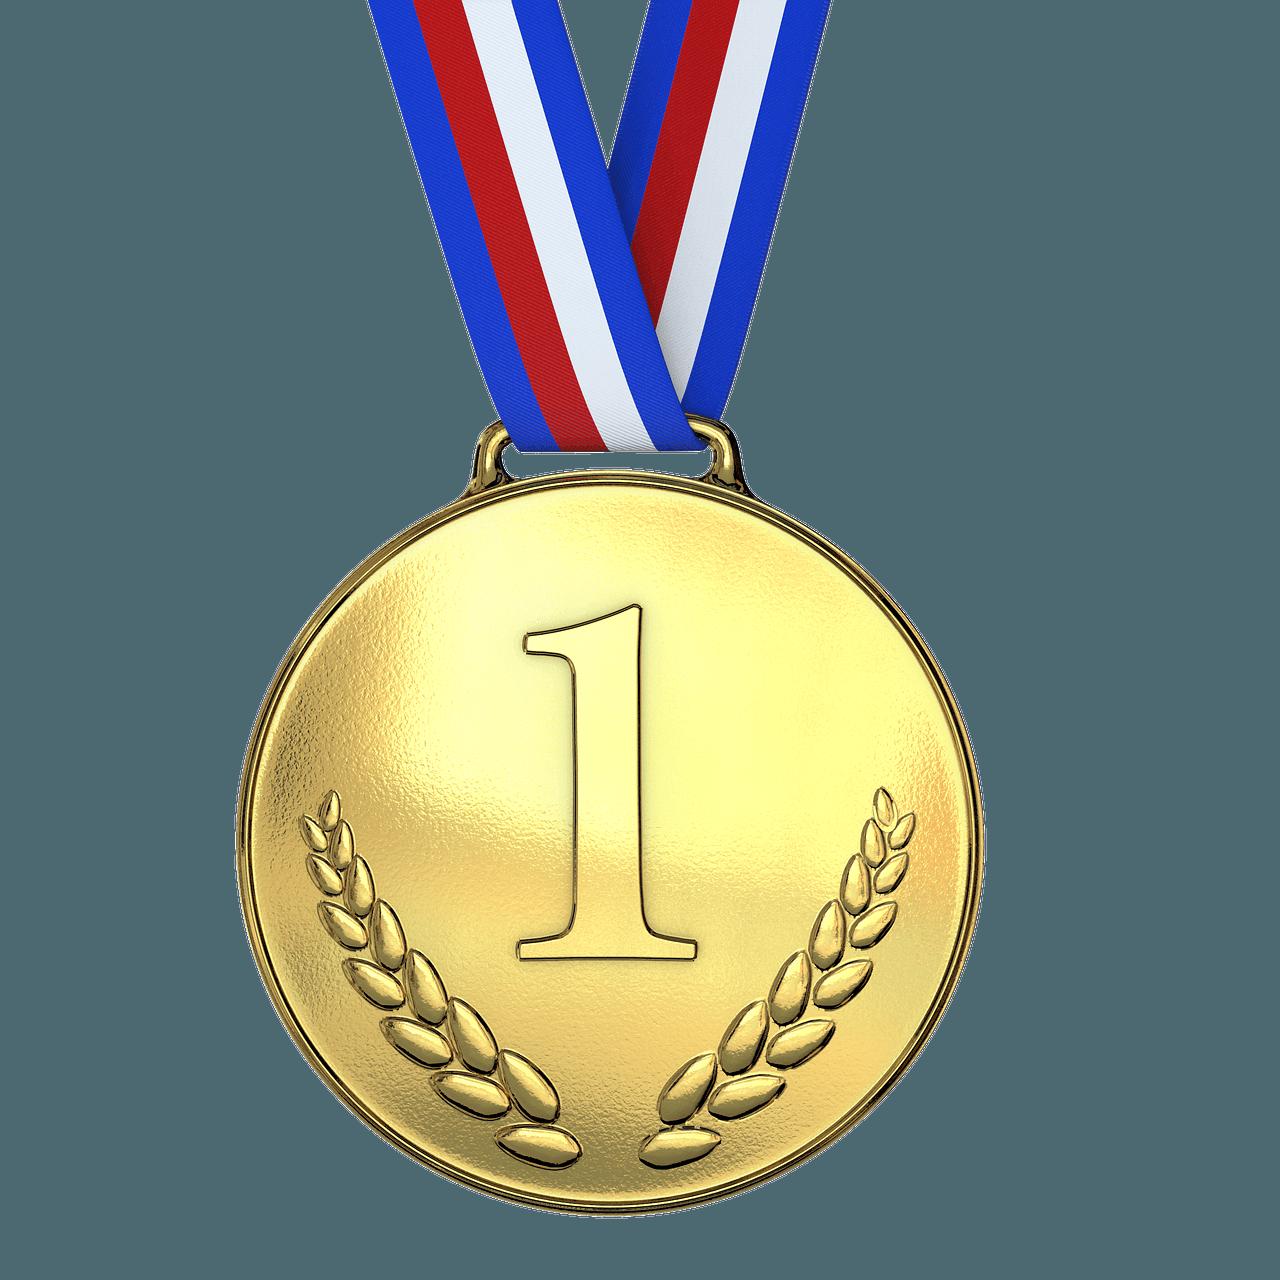 Flotte medaljer til alle sportsgrene - find dem online